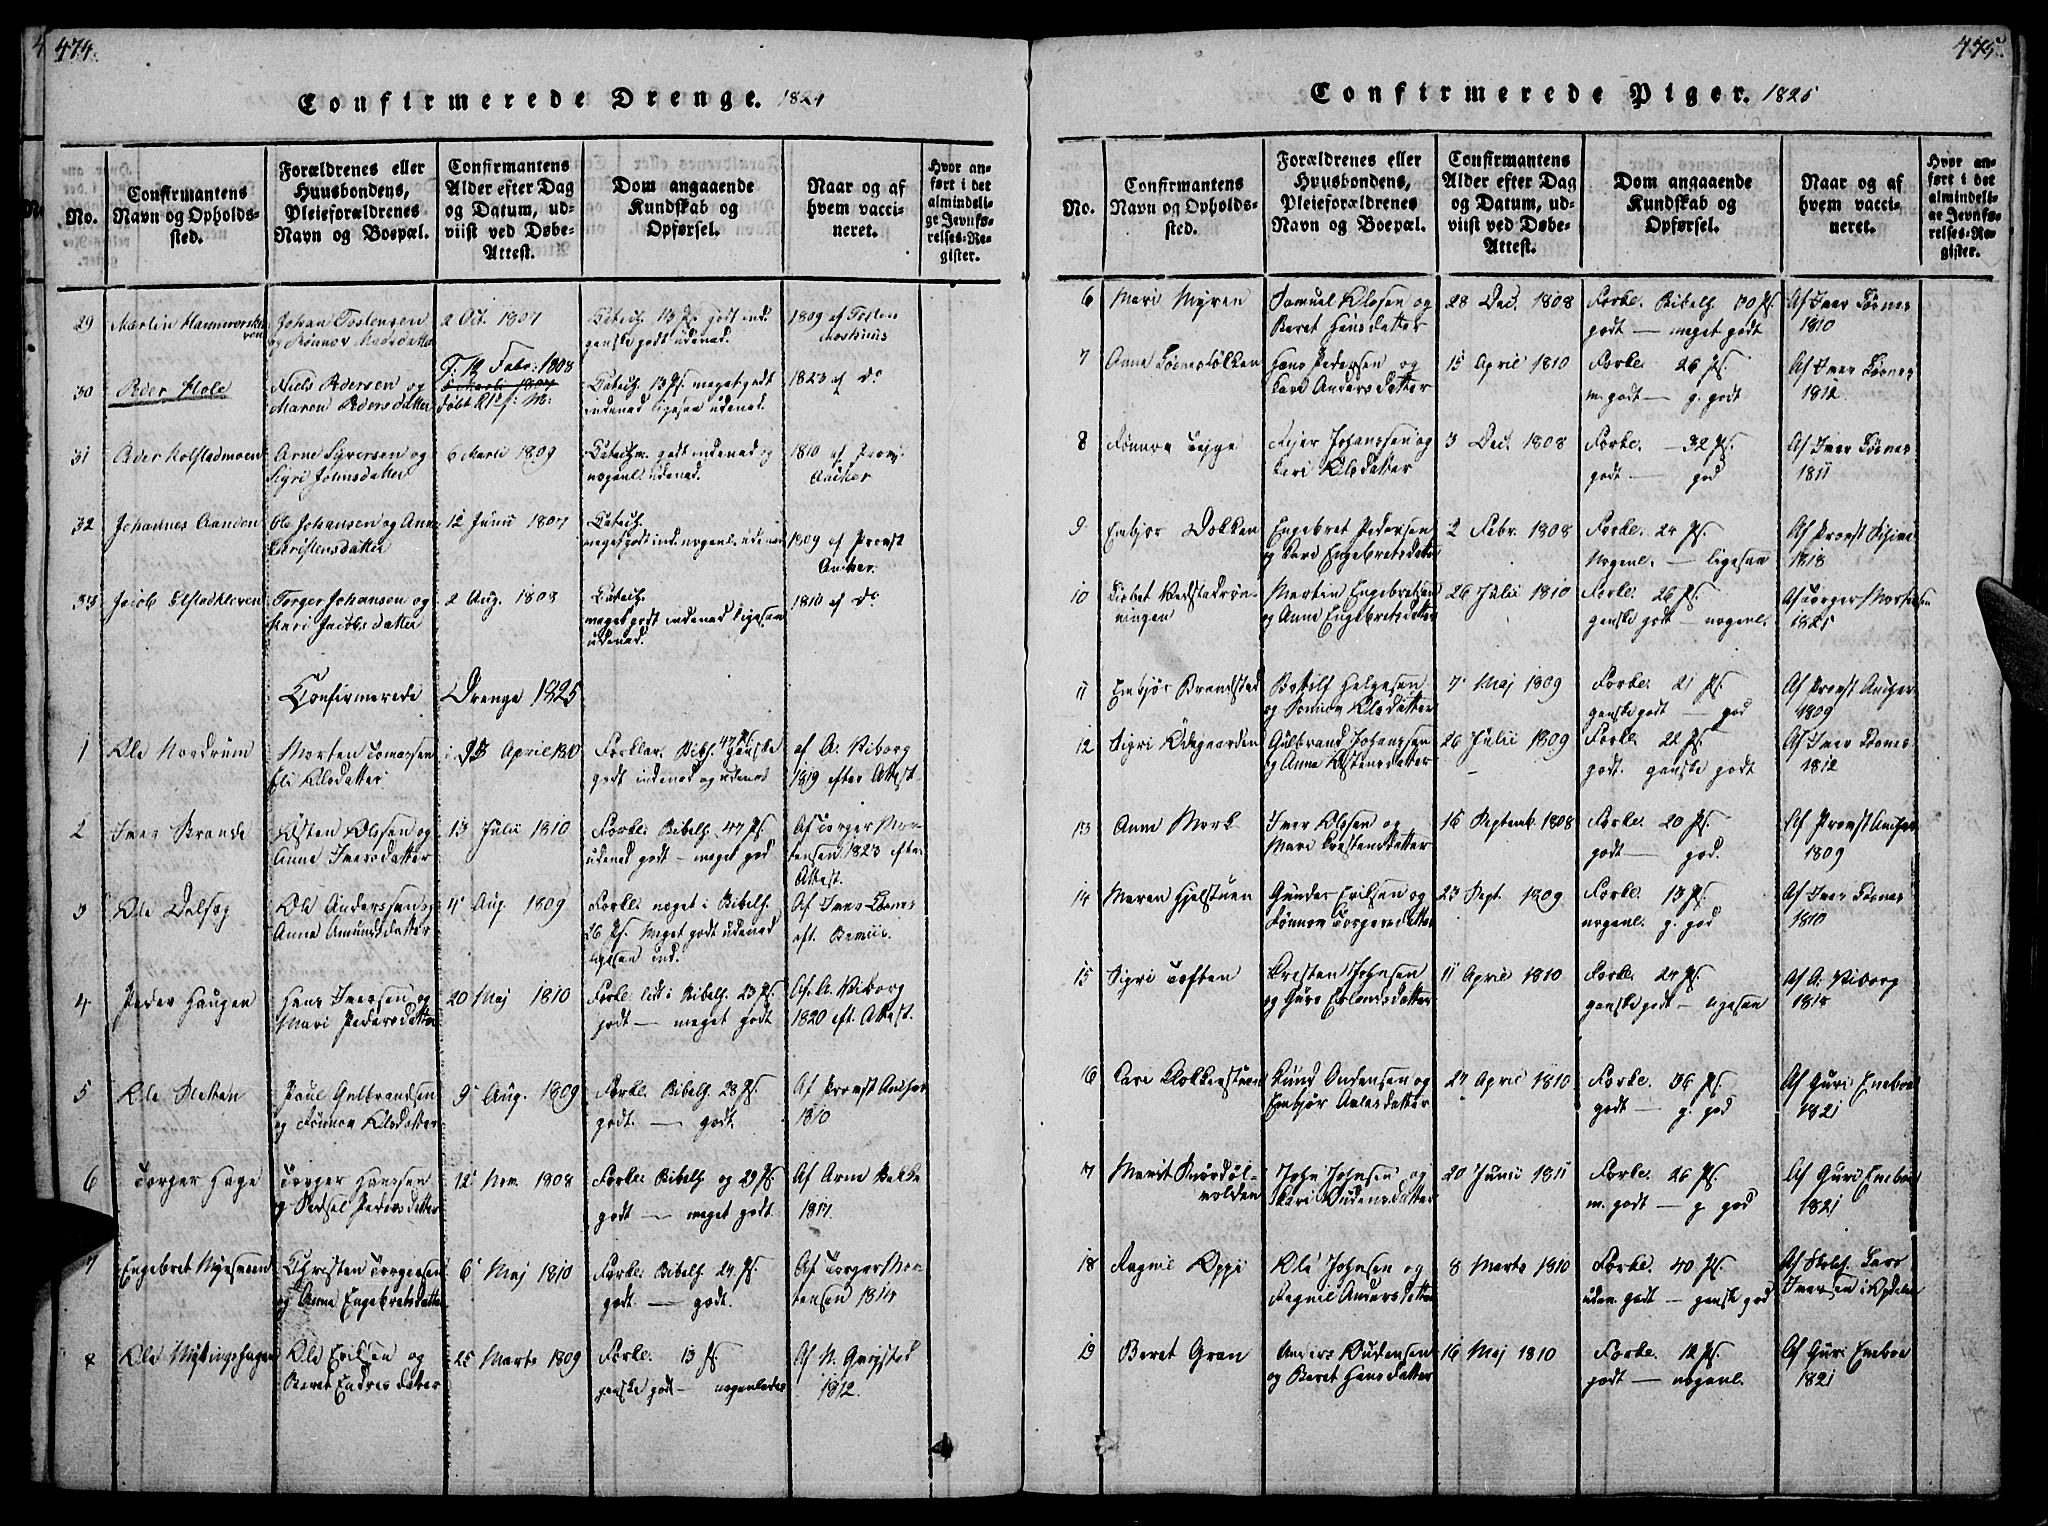 SAH, Ringebu prestekontor, Ministerialbok nr. 4, 1821-1839, s. 474-475